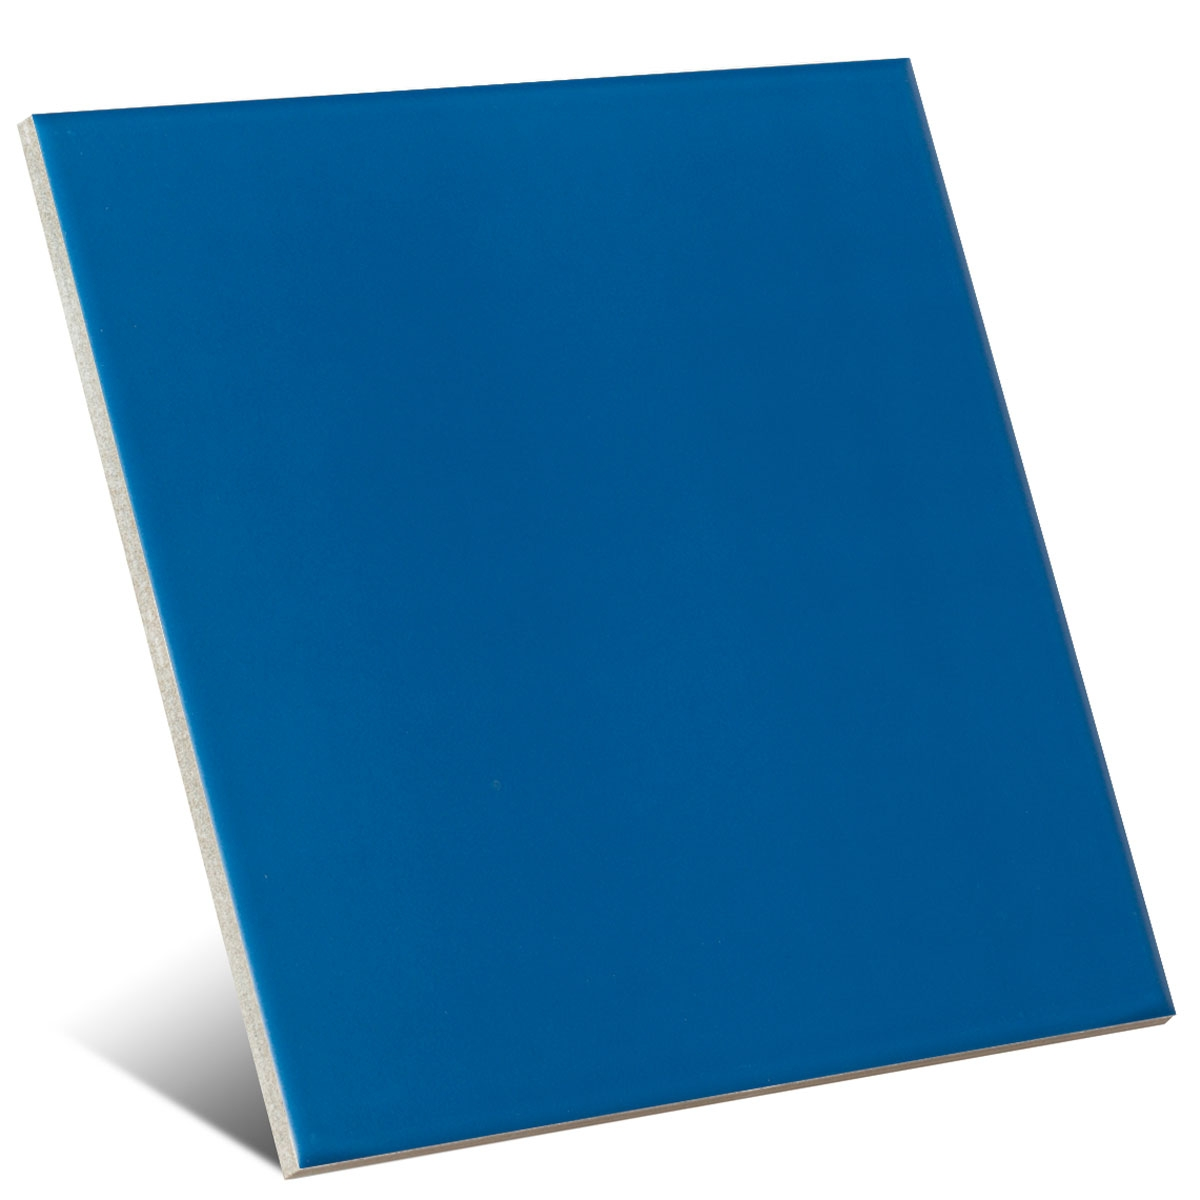 Color azul oscuro mate 20x20 cm (caja 1 m2)